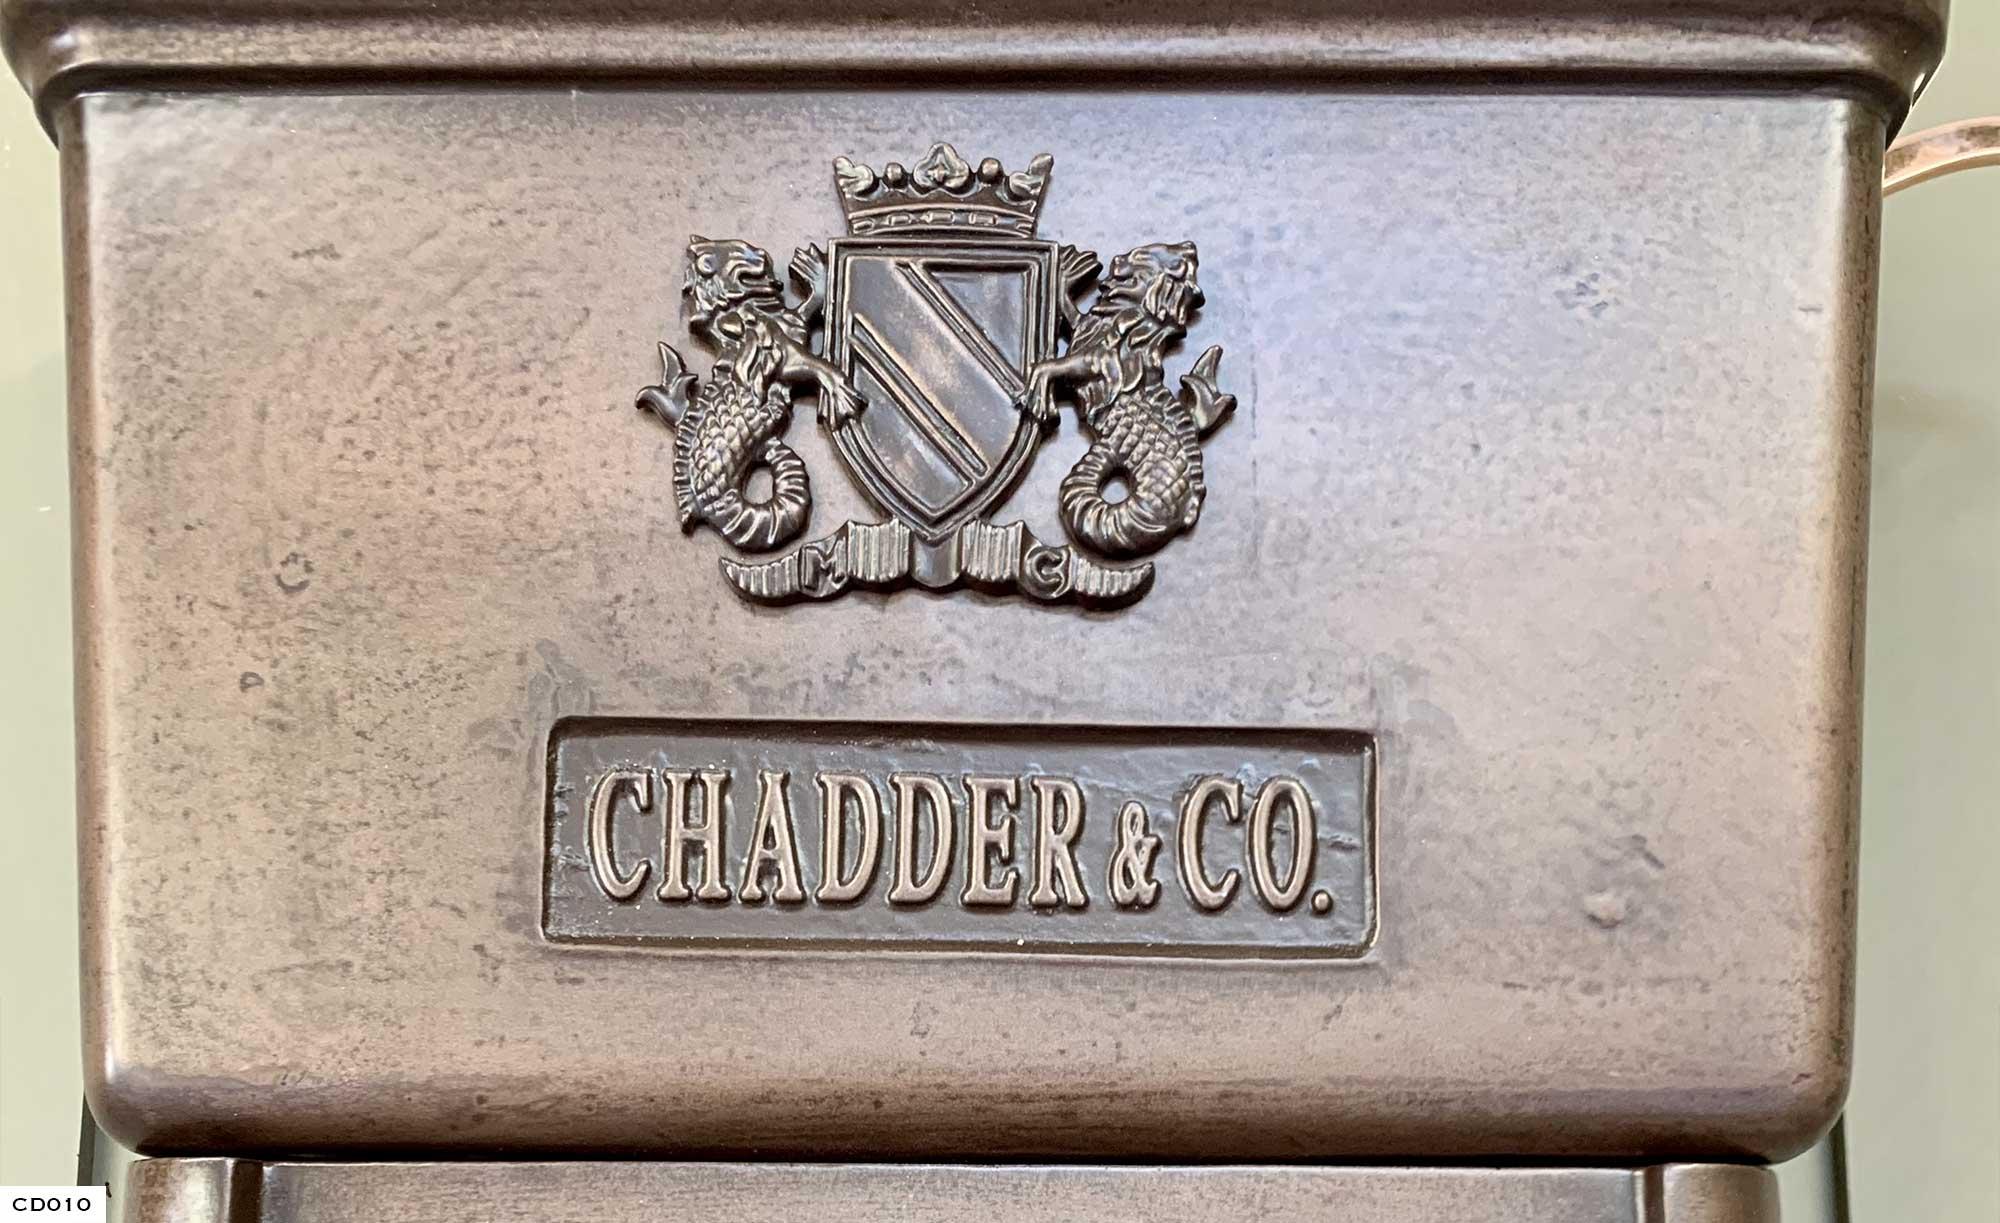 Copper/Bronze Toilets, Bespoke Cisterns, Chadder Design, Copper Bathrooms, Bespoke Toilet Cisterns